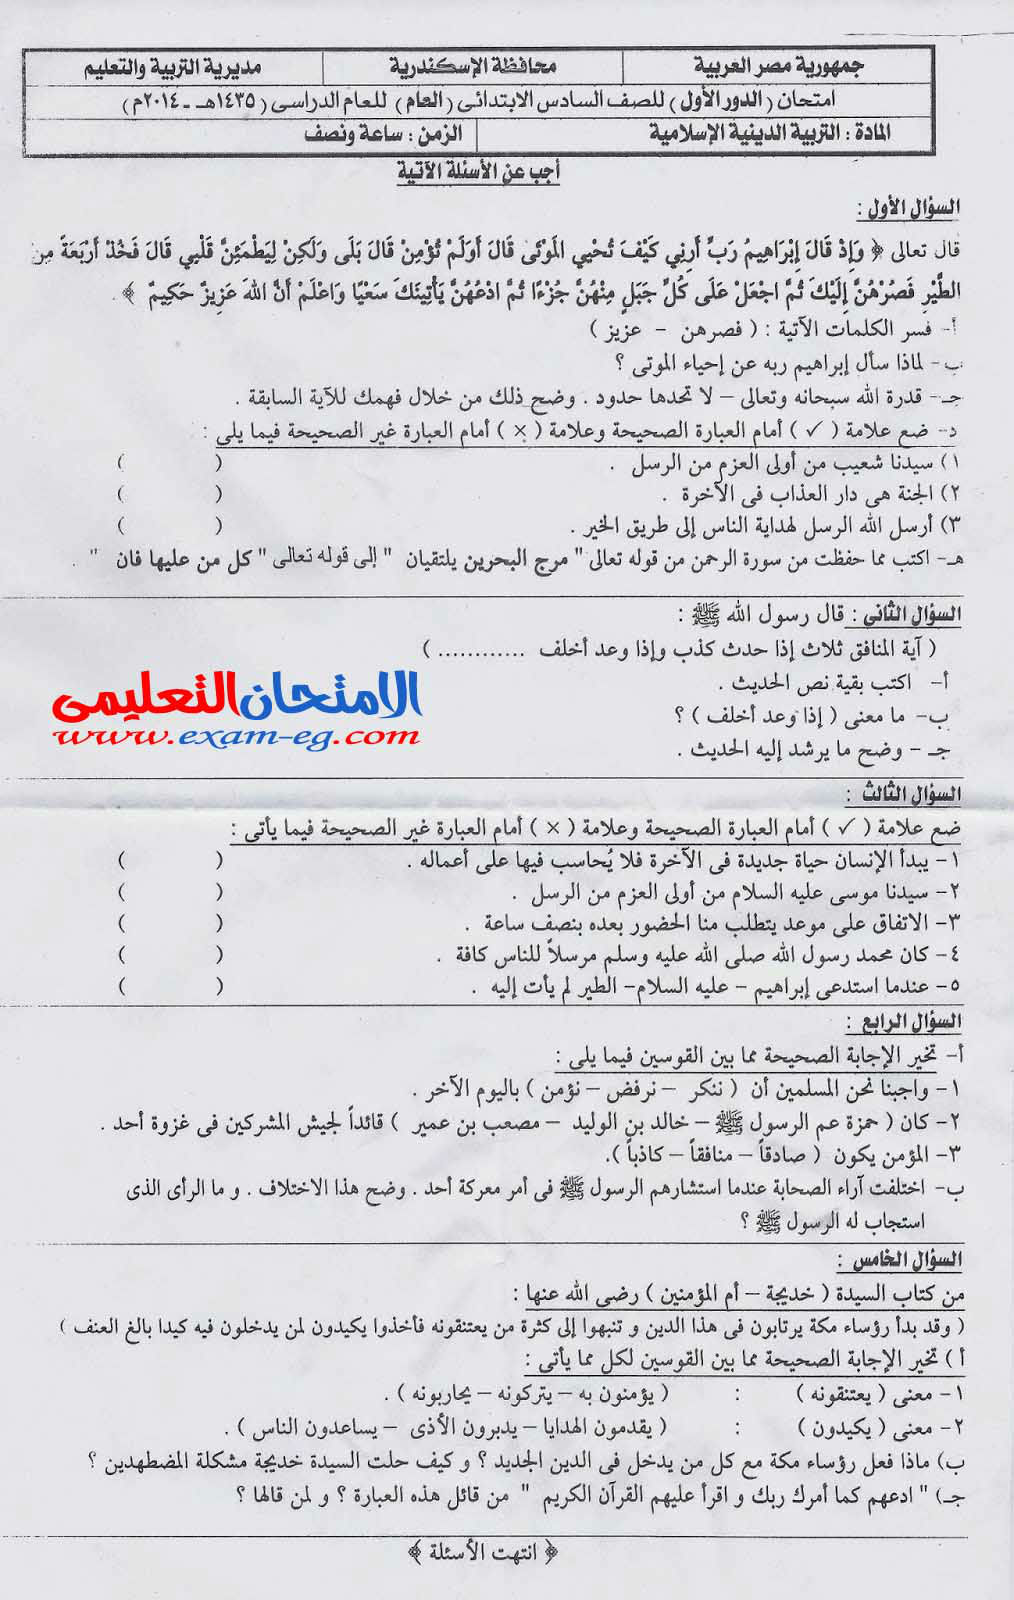 exam-eg.com_1400345406731.jpg